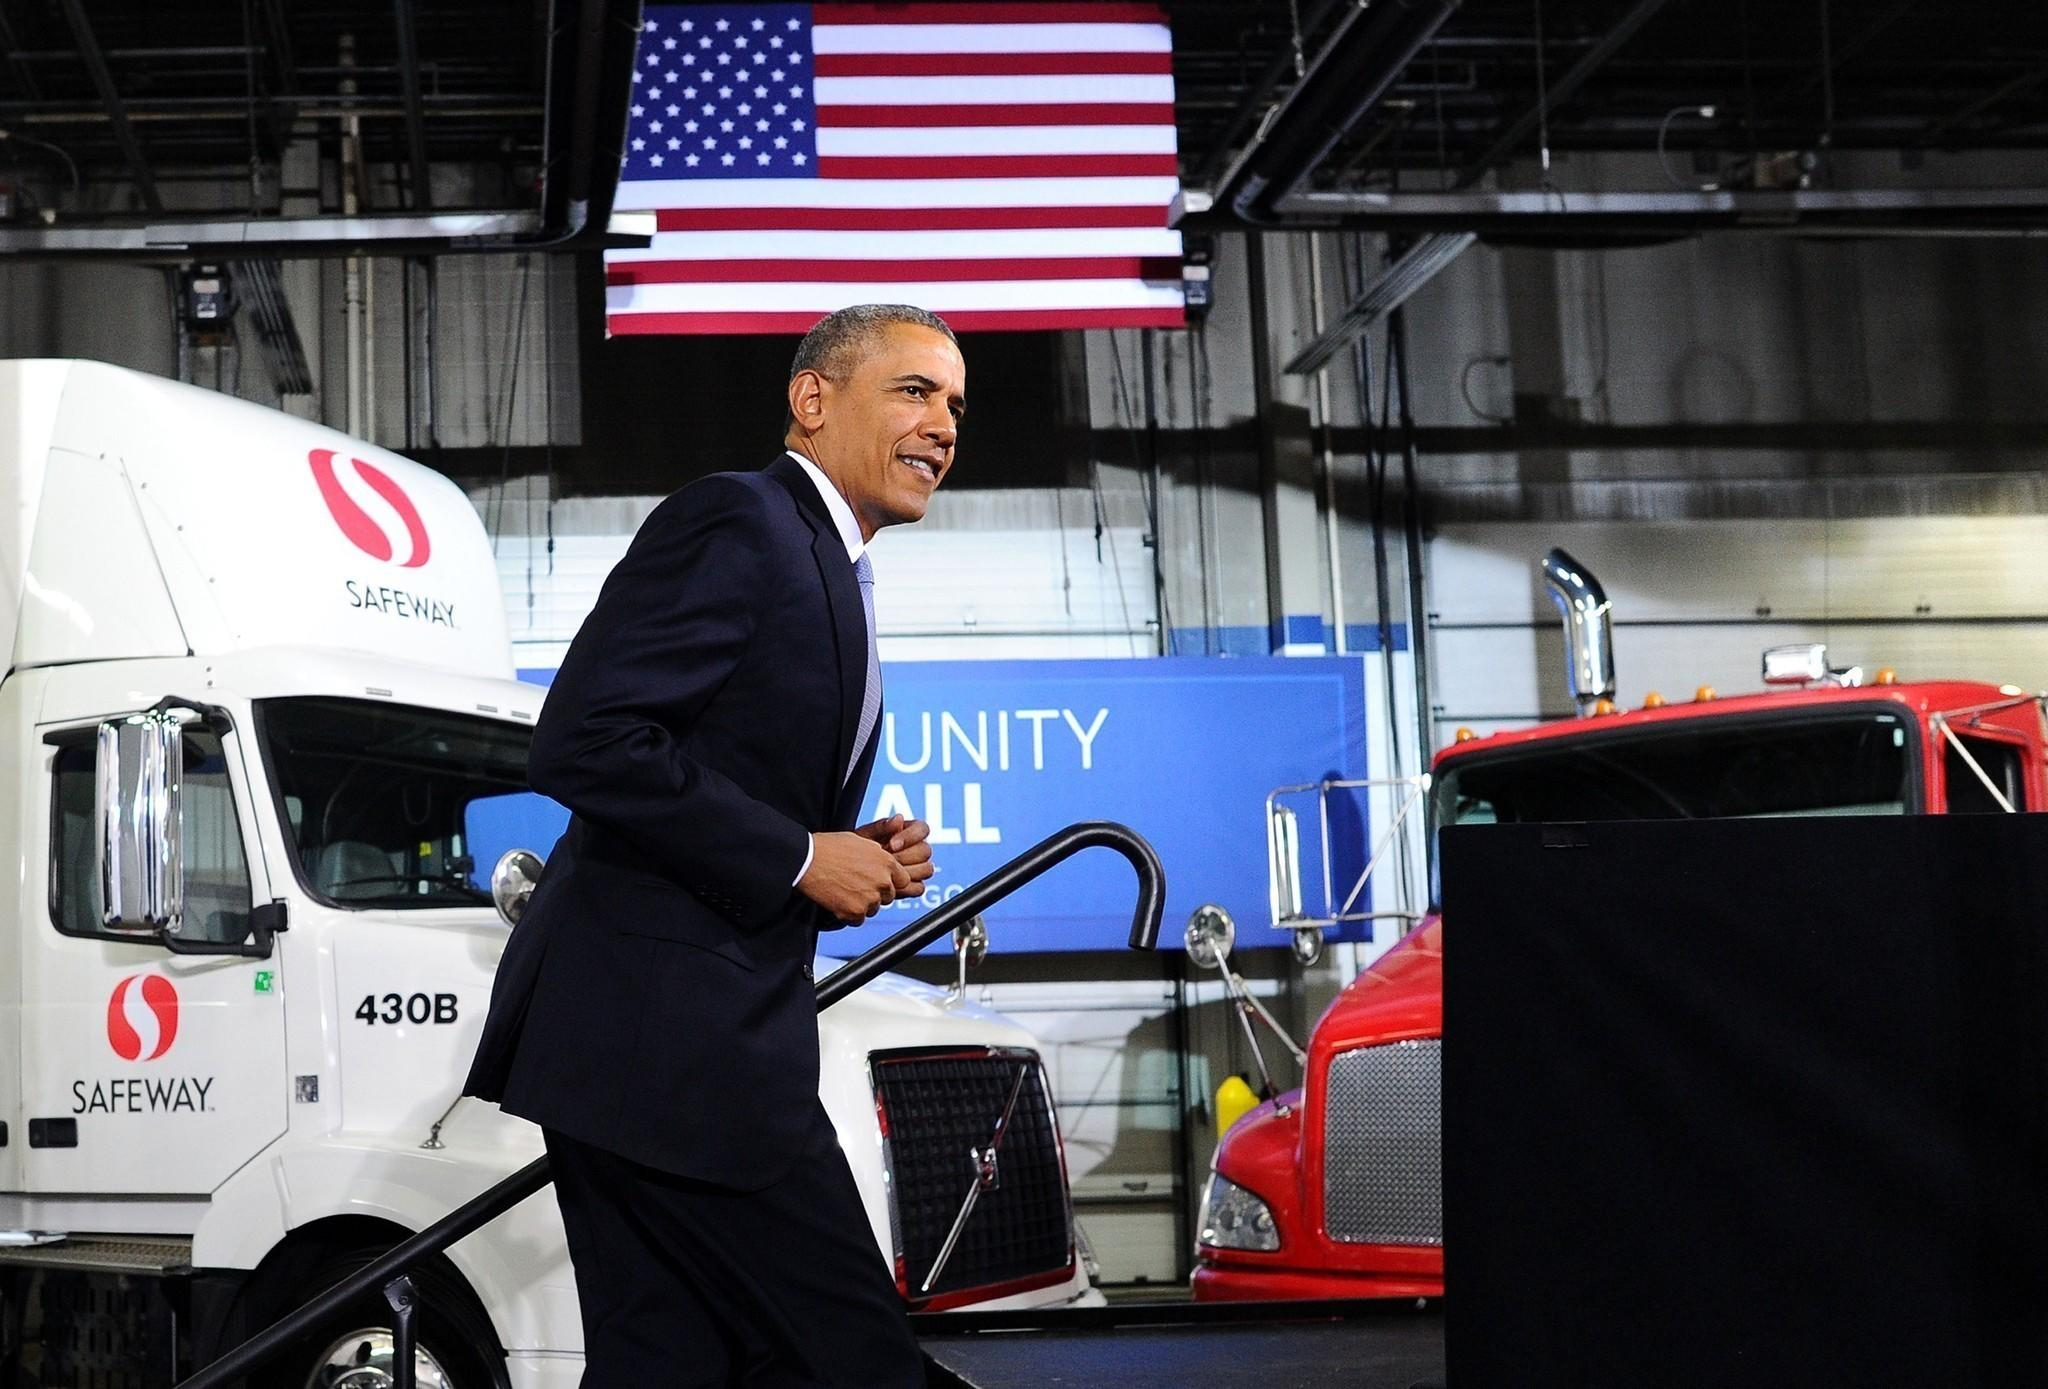 President Barack Obama walks on stage to speak on the economy at the Safeway Distribution Center in Upper Marlboro, Md.